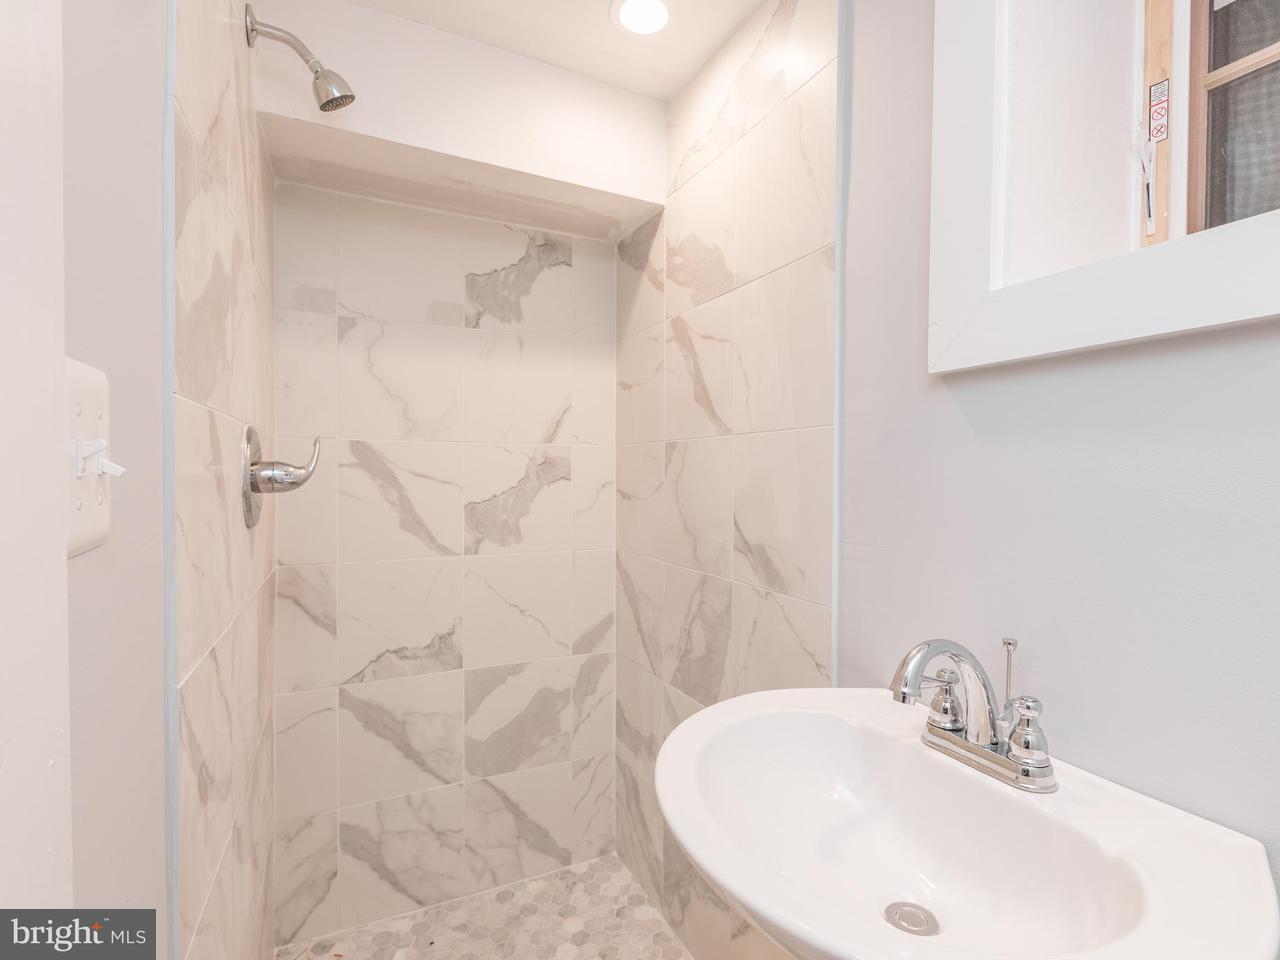 Additional photo for property listing at 2710 Poplar St Nw 2710 Poplar St Nw Washington, Округ Колумбия 20007 Соединенные Штаты